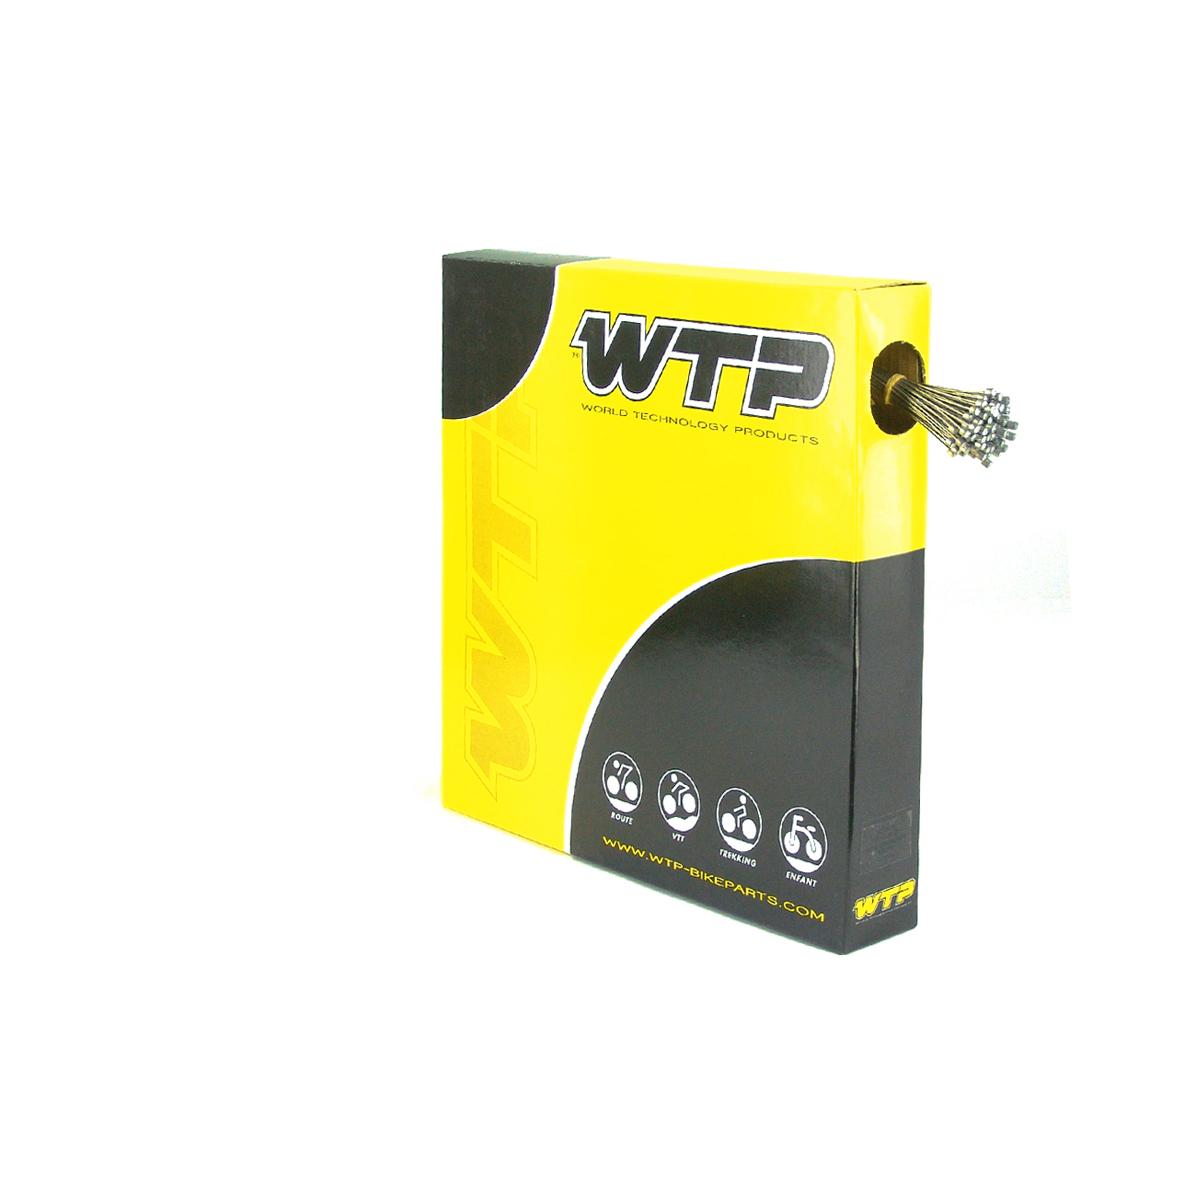 Câble frein vélo WTP VTT acier inoxydable (boîte de 100)